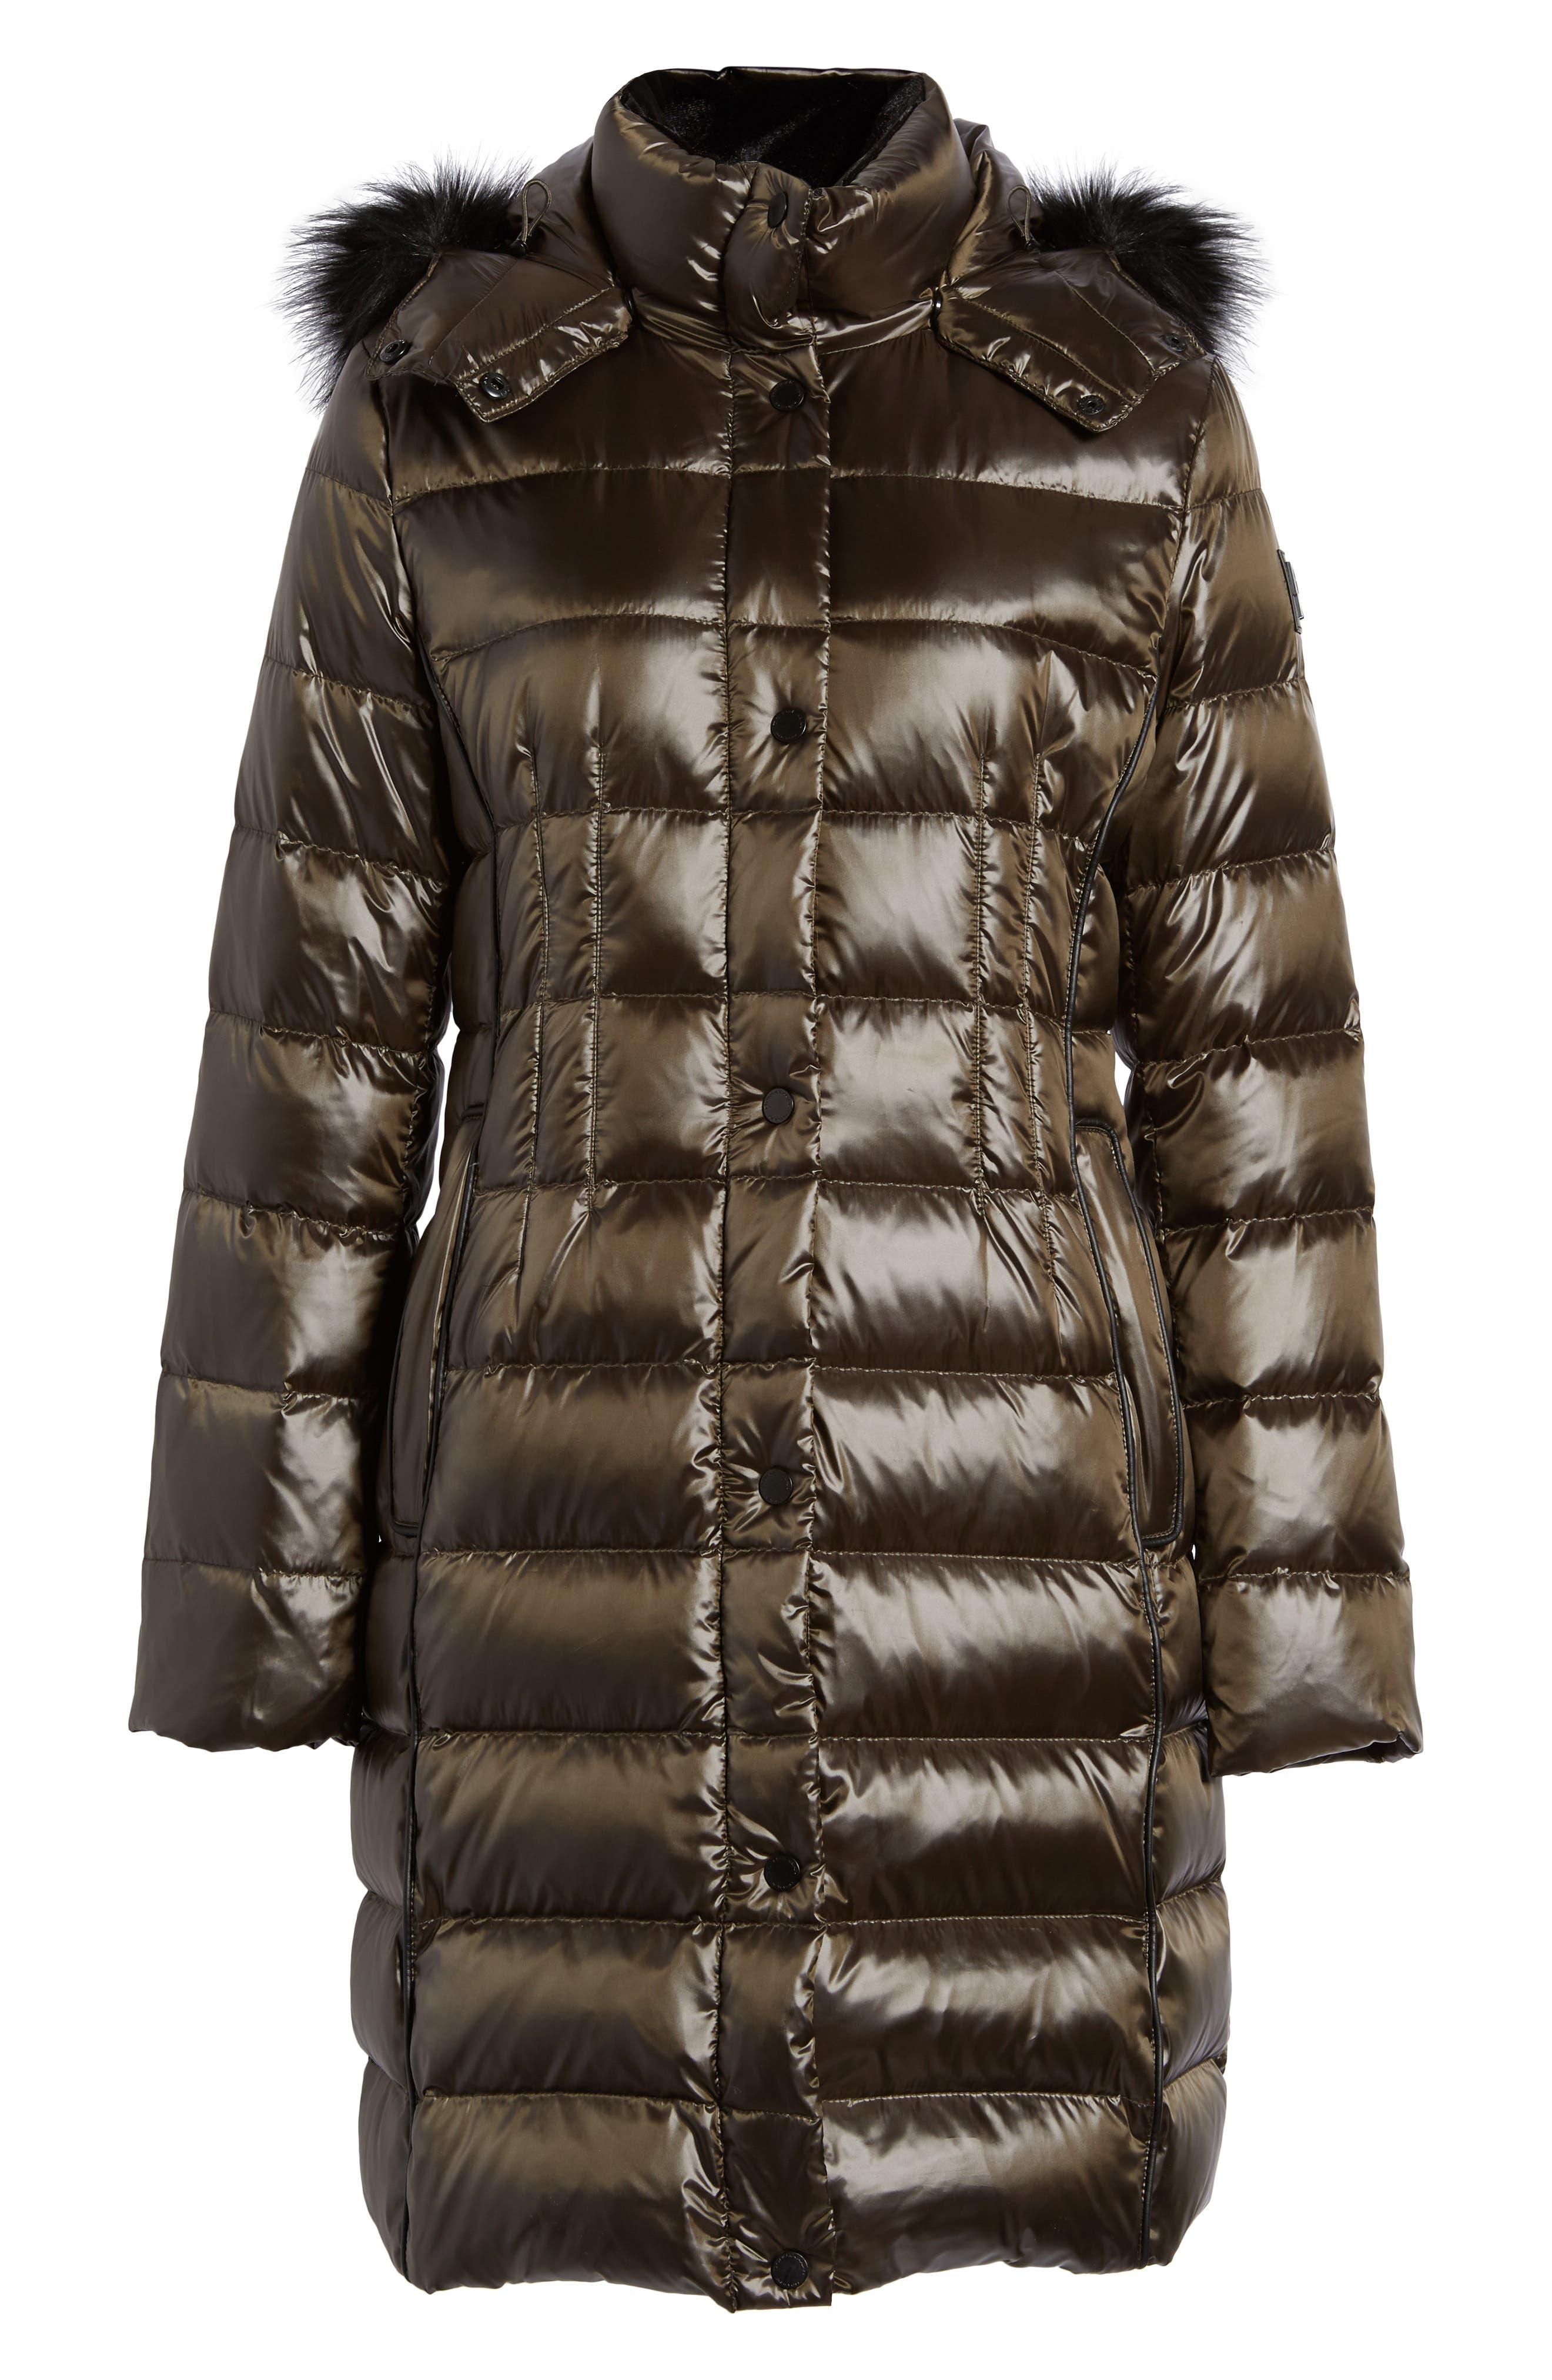 Alternate Image 1 Selected - Donna Karan New York Down Puffer Coat with Faux Fur Trim